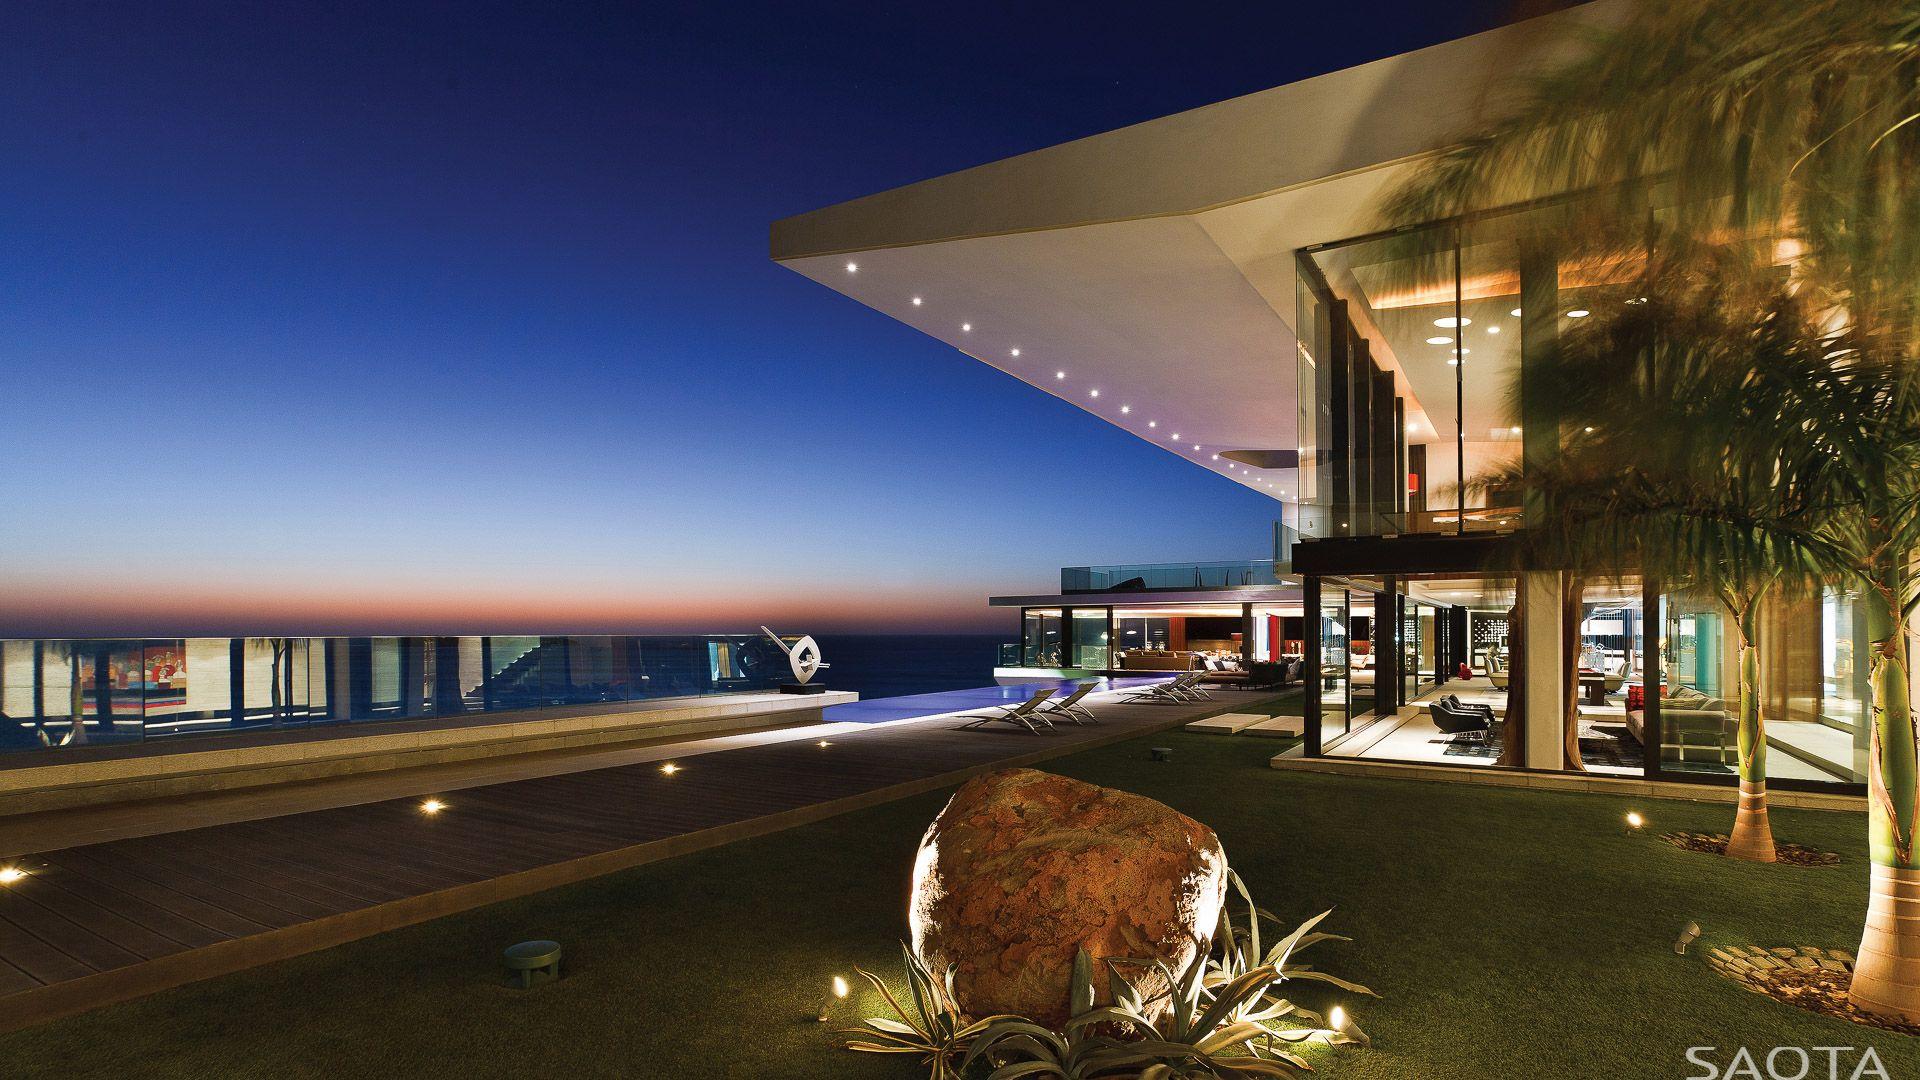 Cliff House Situated Dakar Steep Overlooking The Atlantic Ocean Dramatic